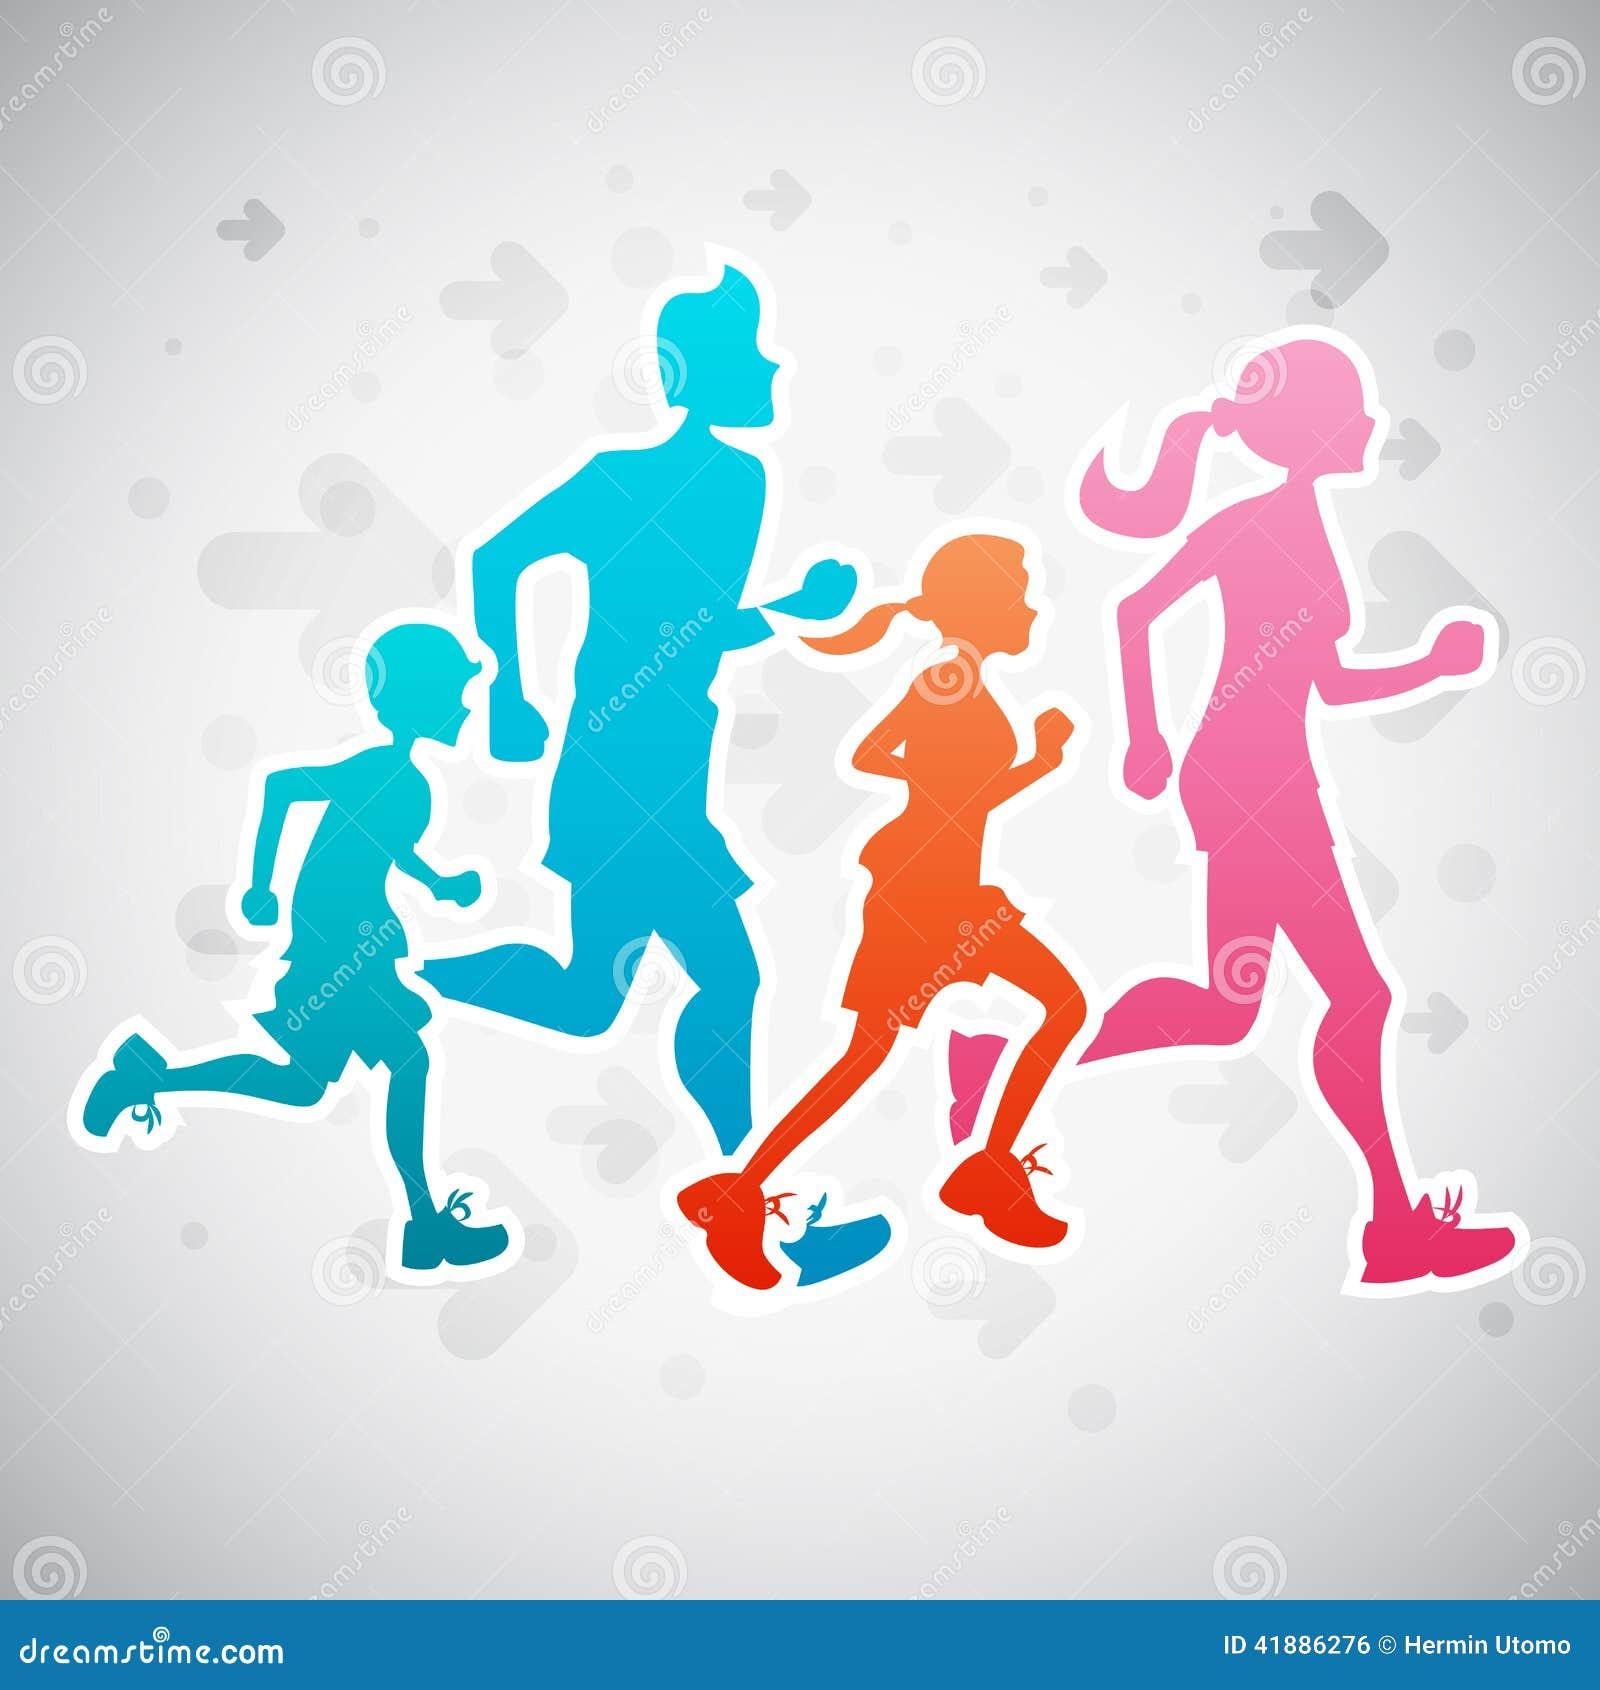 family running clipart - photo #10